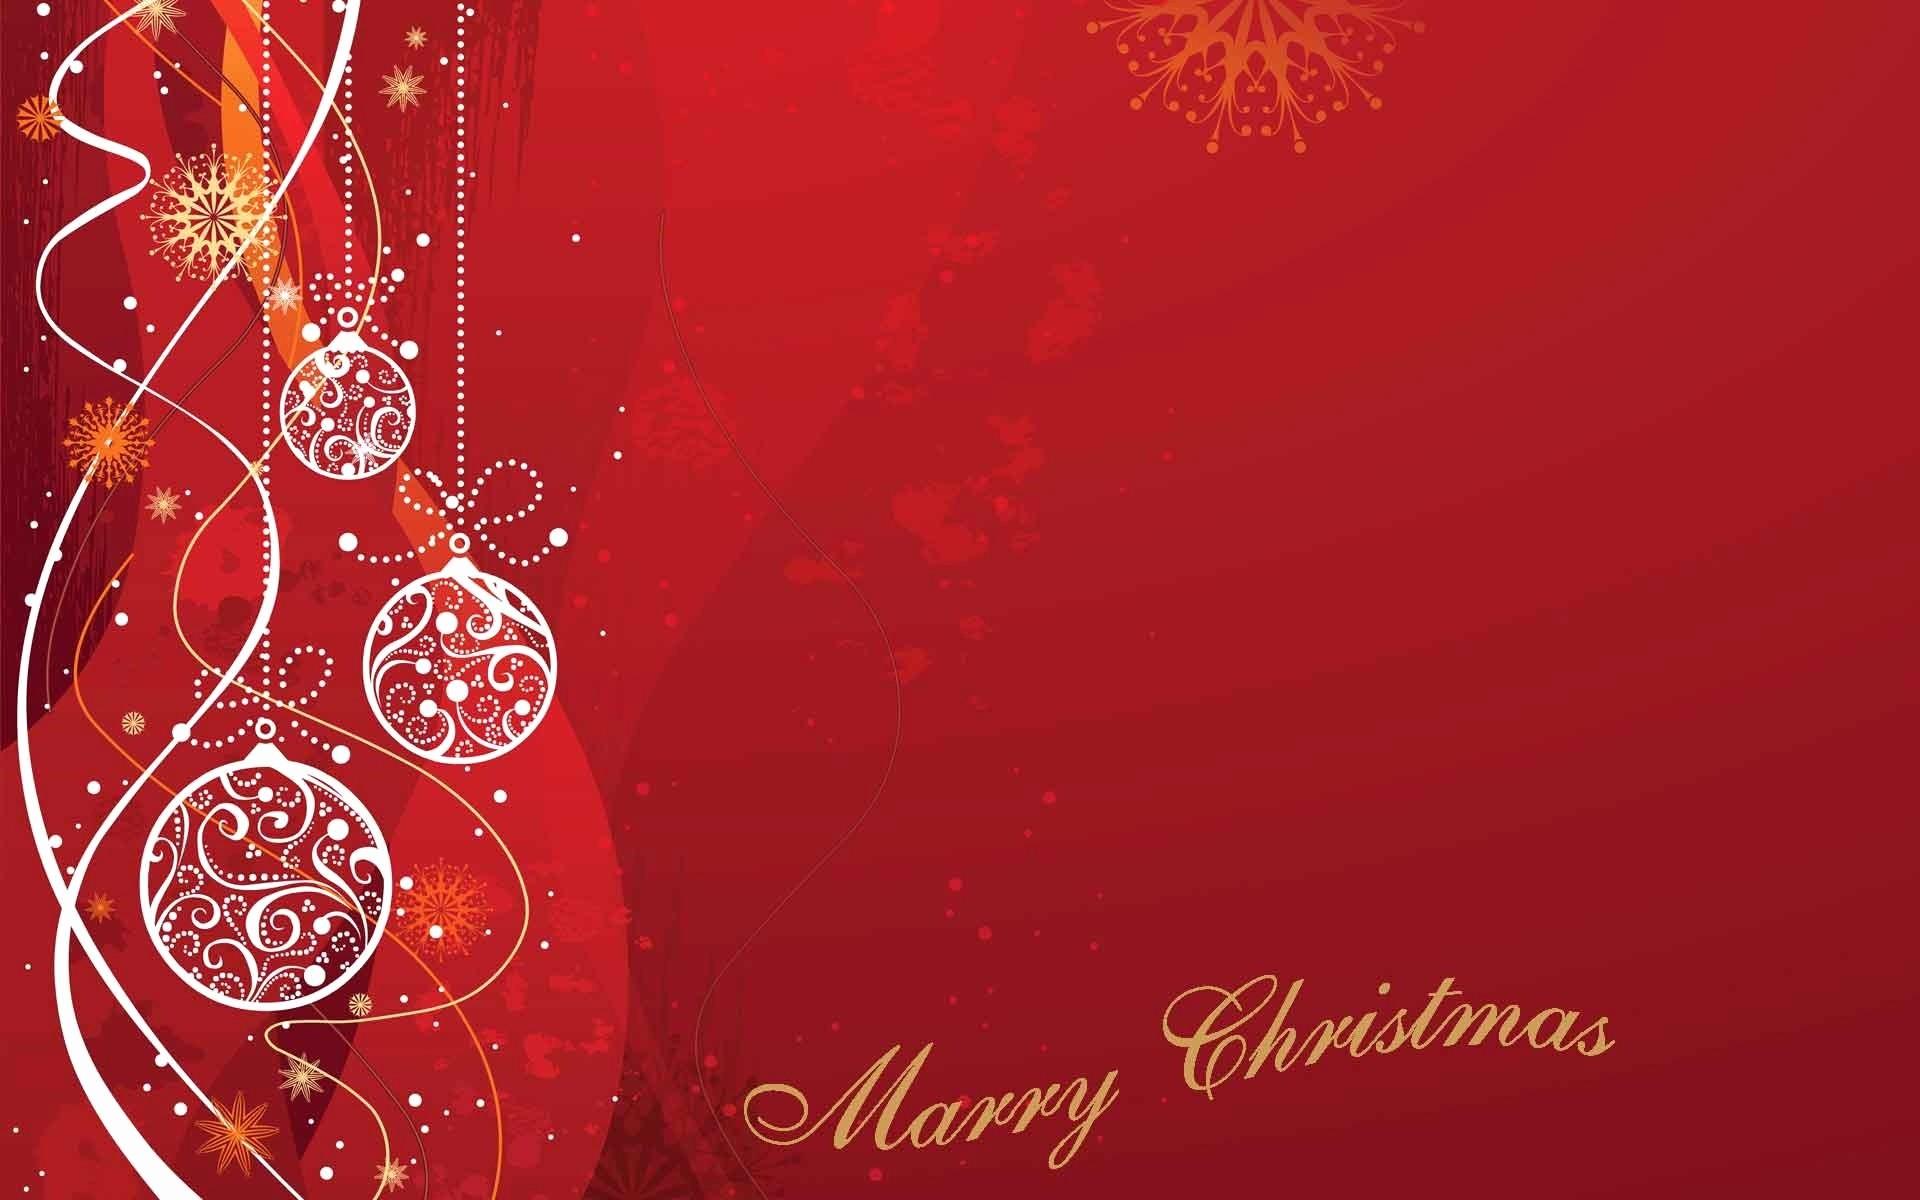 Microsoft Word Christmas Card Templates Luxury Word Christmas Card Template Portablegasgrillweber